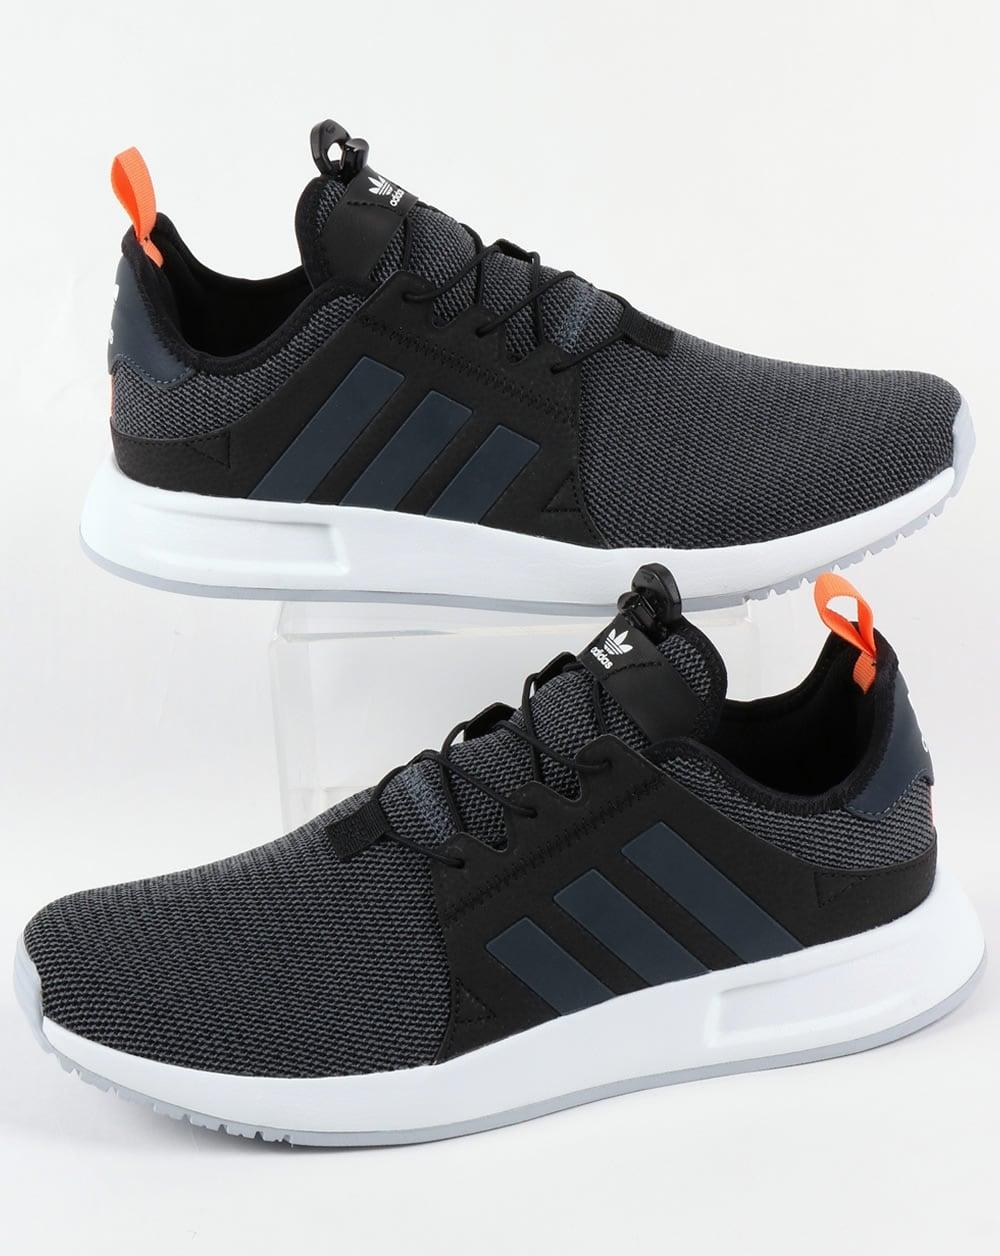 Adidas XPLR Trainers Black/Bold Onix